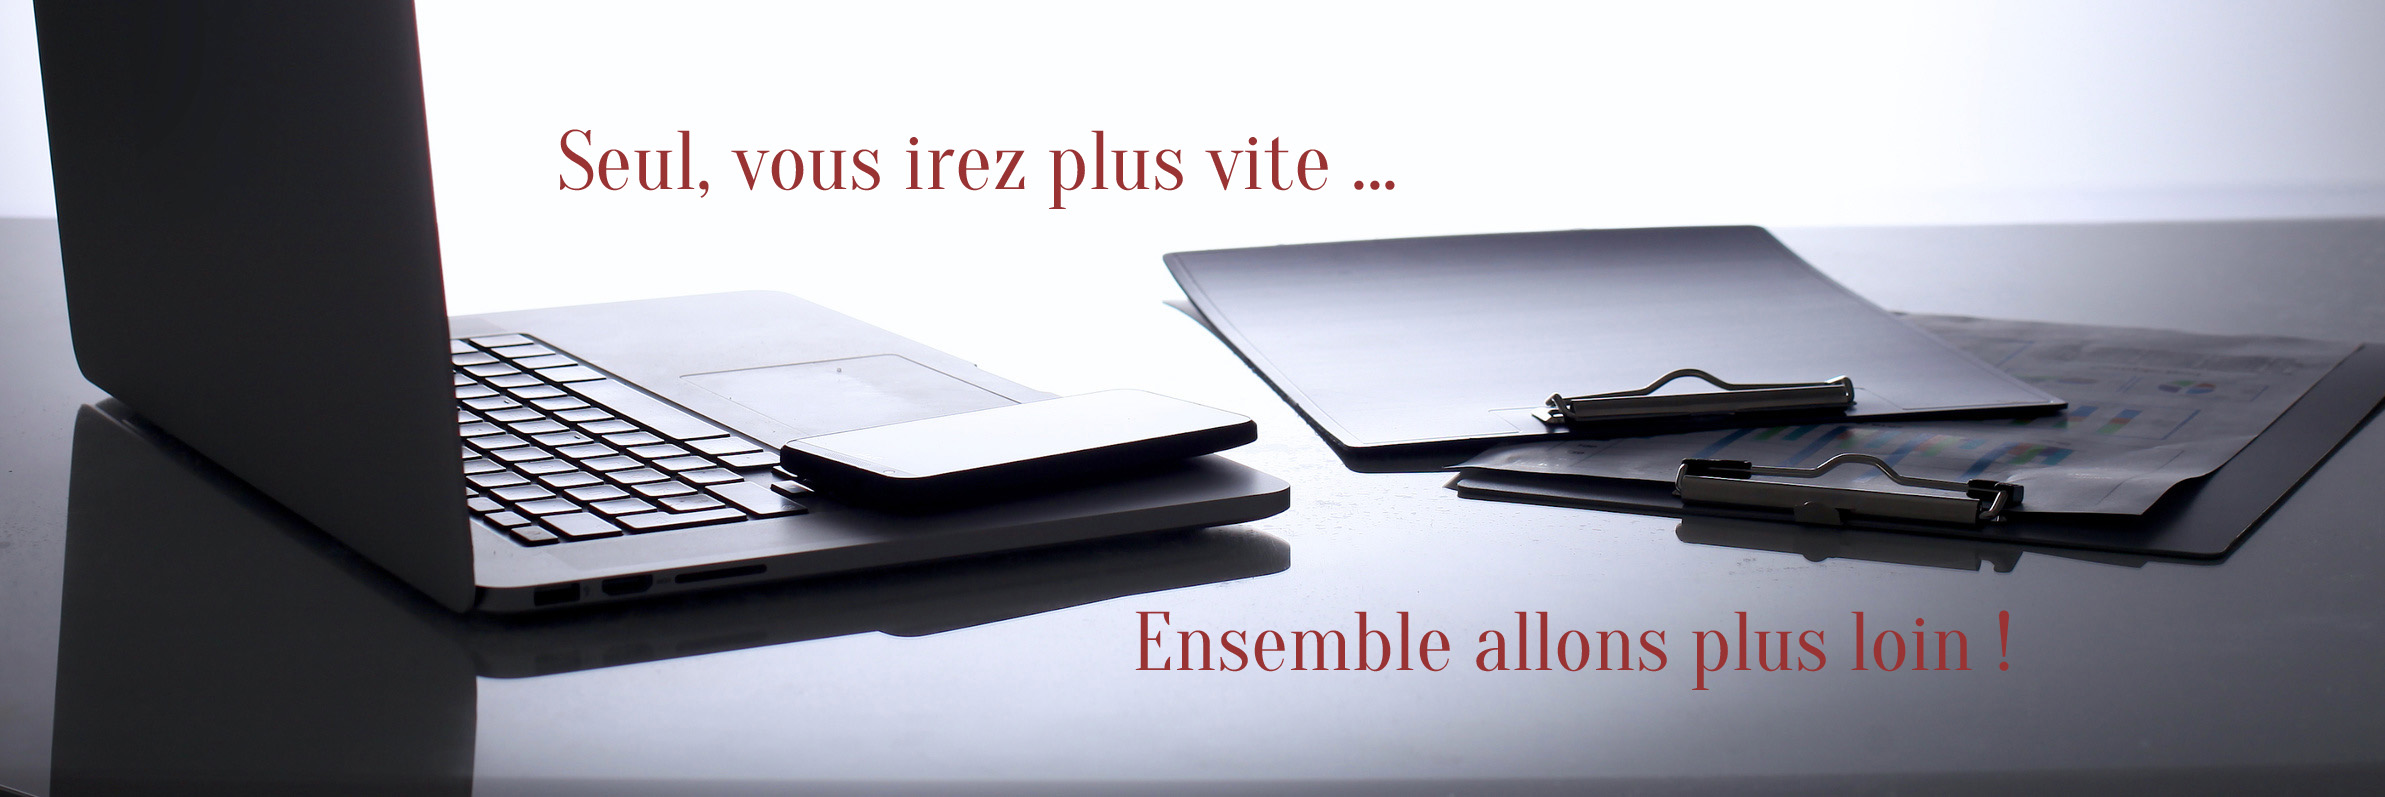 comptabilit-fiscalit-gestion-mouscron-tournai-comines-starter